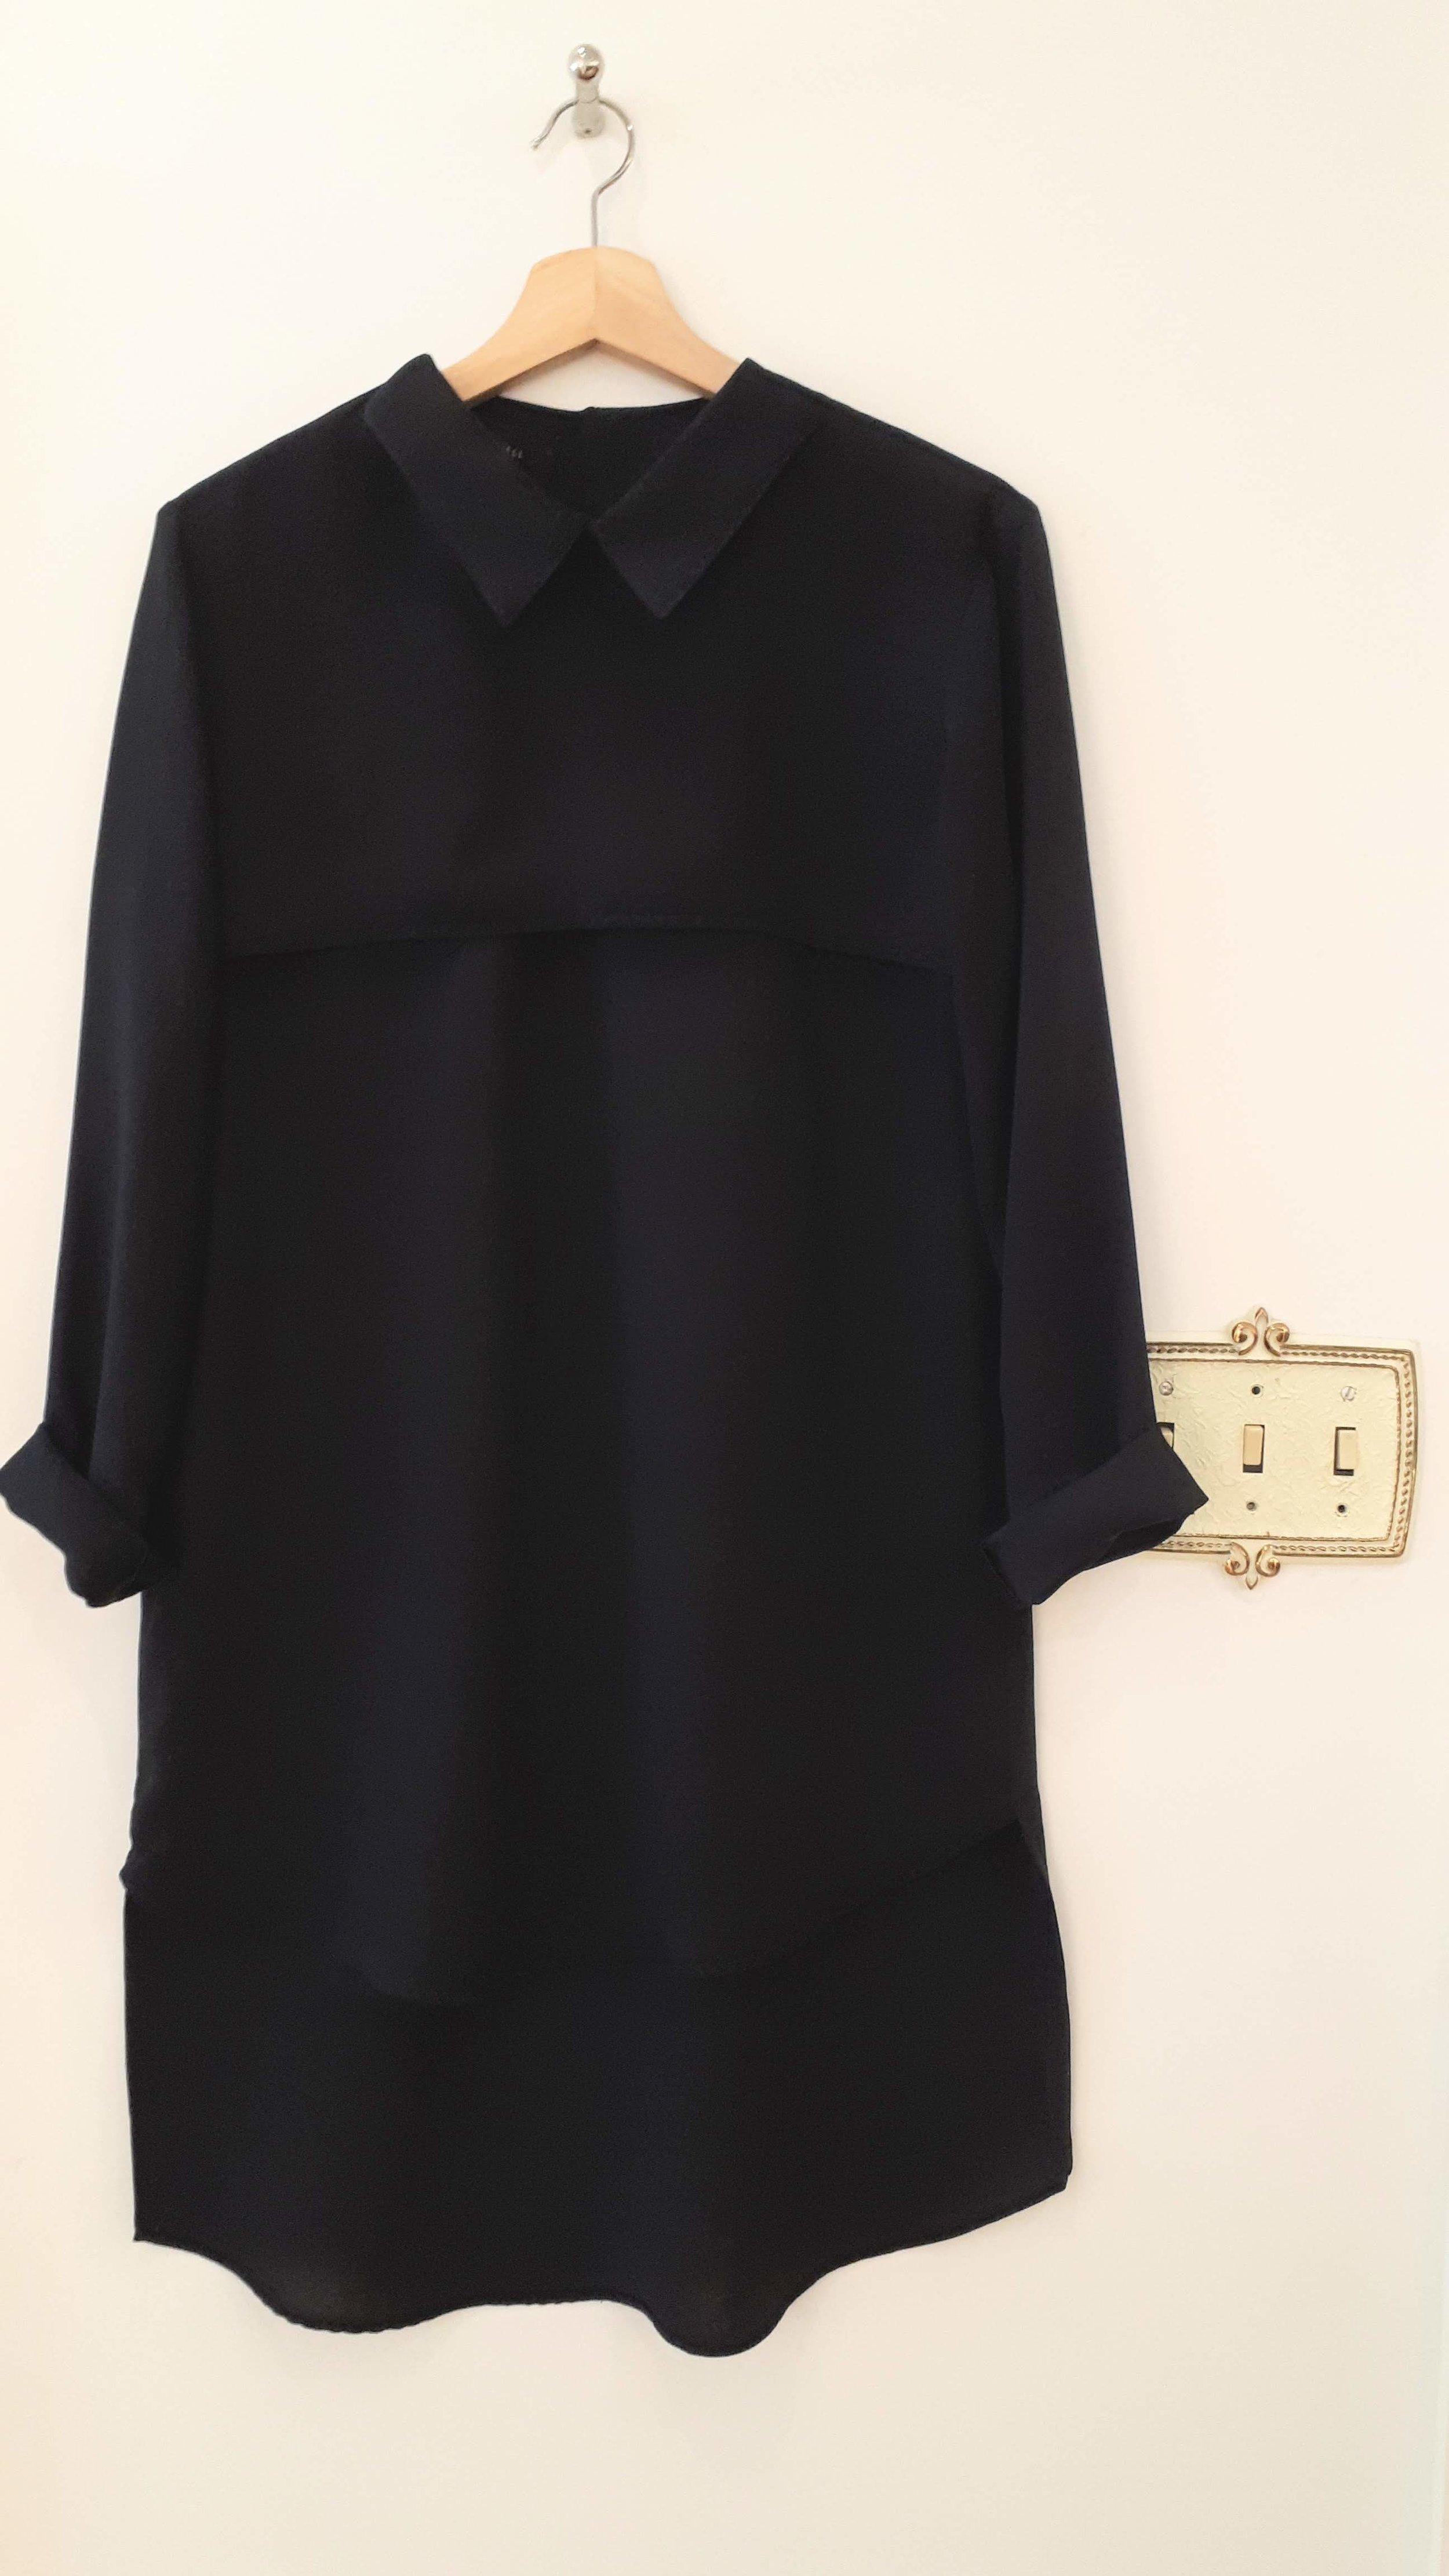 Workhall dress; Size L, $48